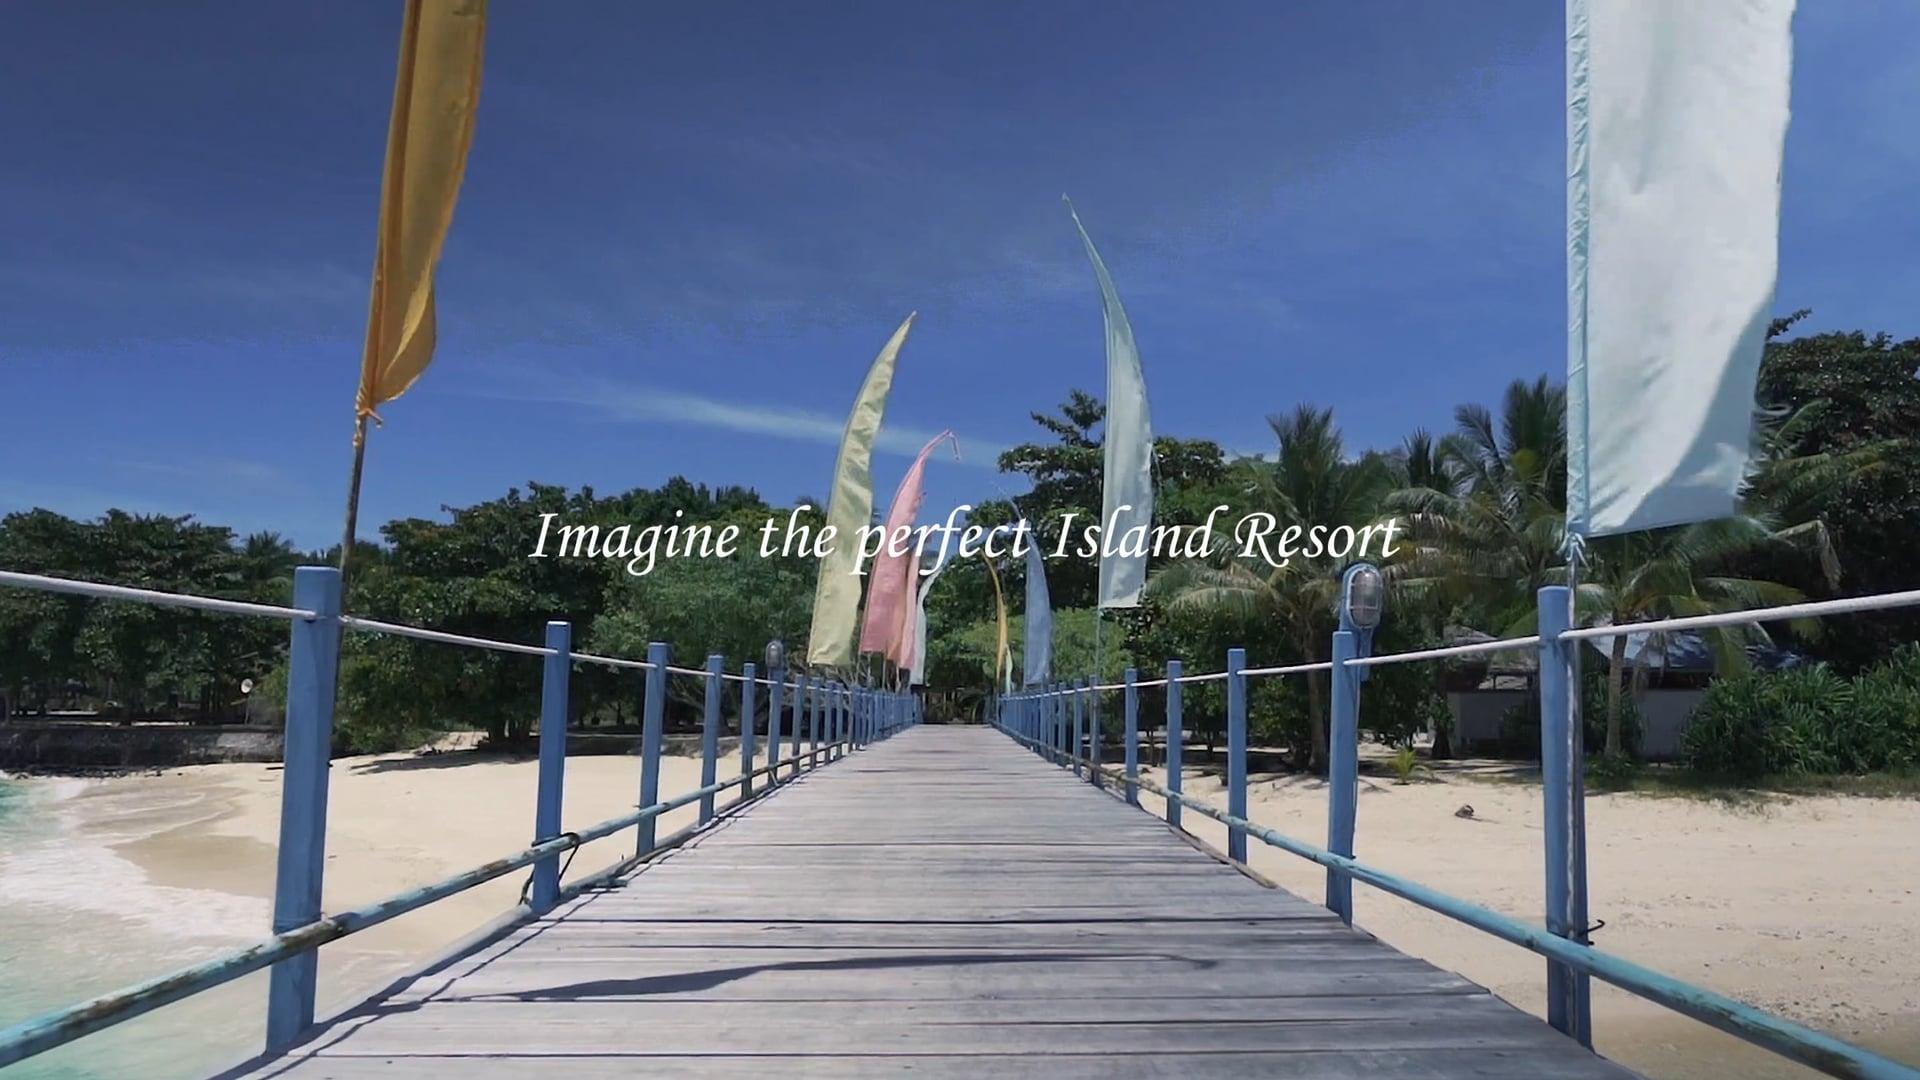 Gangga Island Resort Corporate Promotion